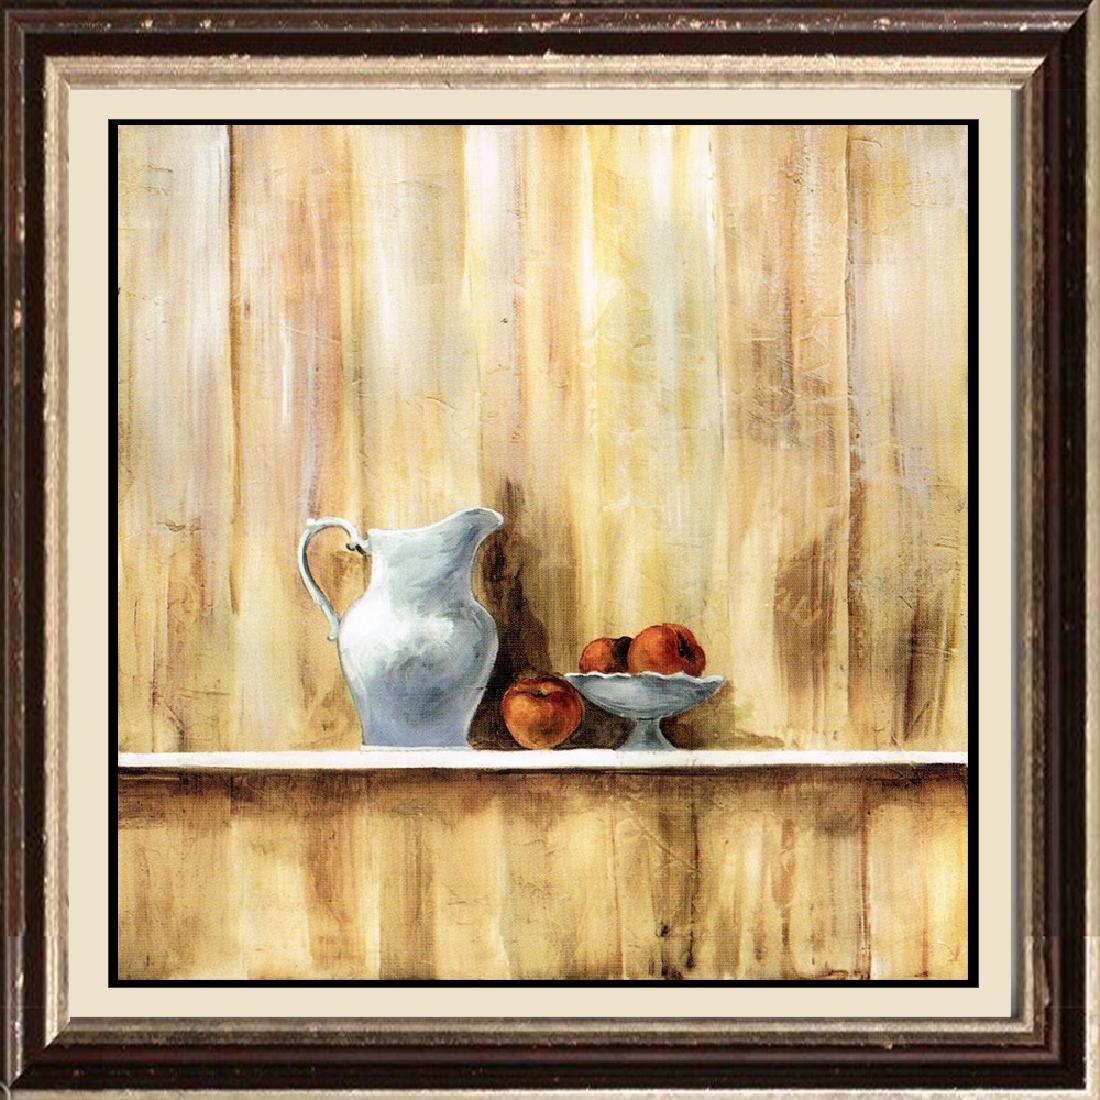 Neum Collection Tetera III Giclee on Canvas  39 x 39